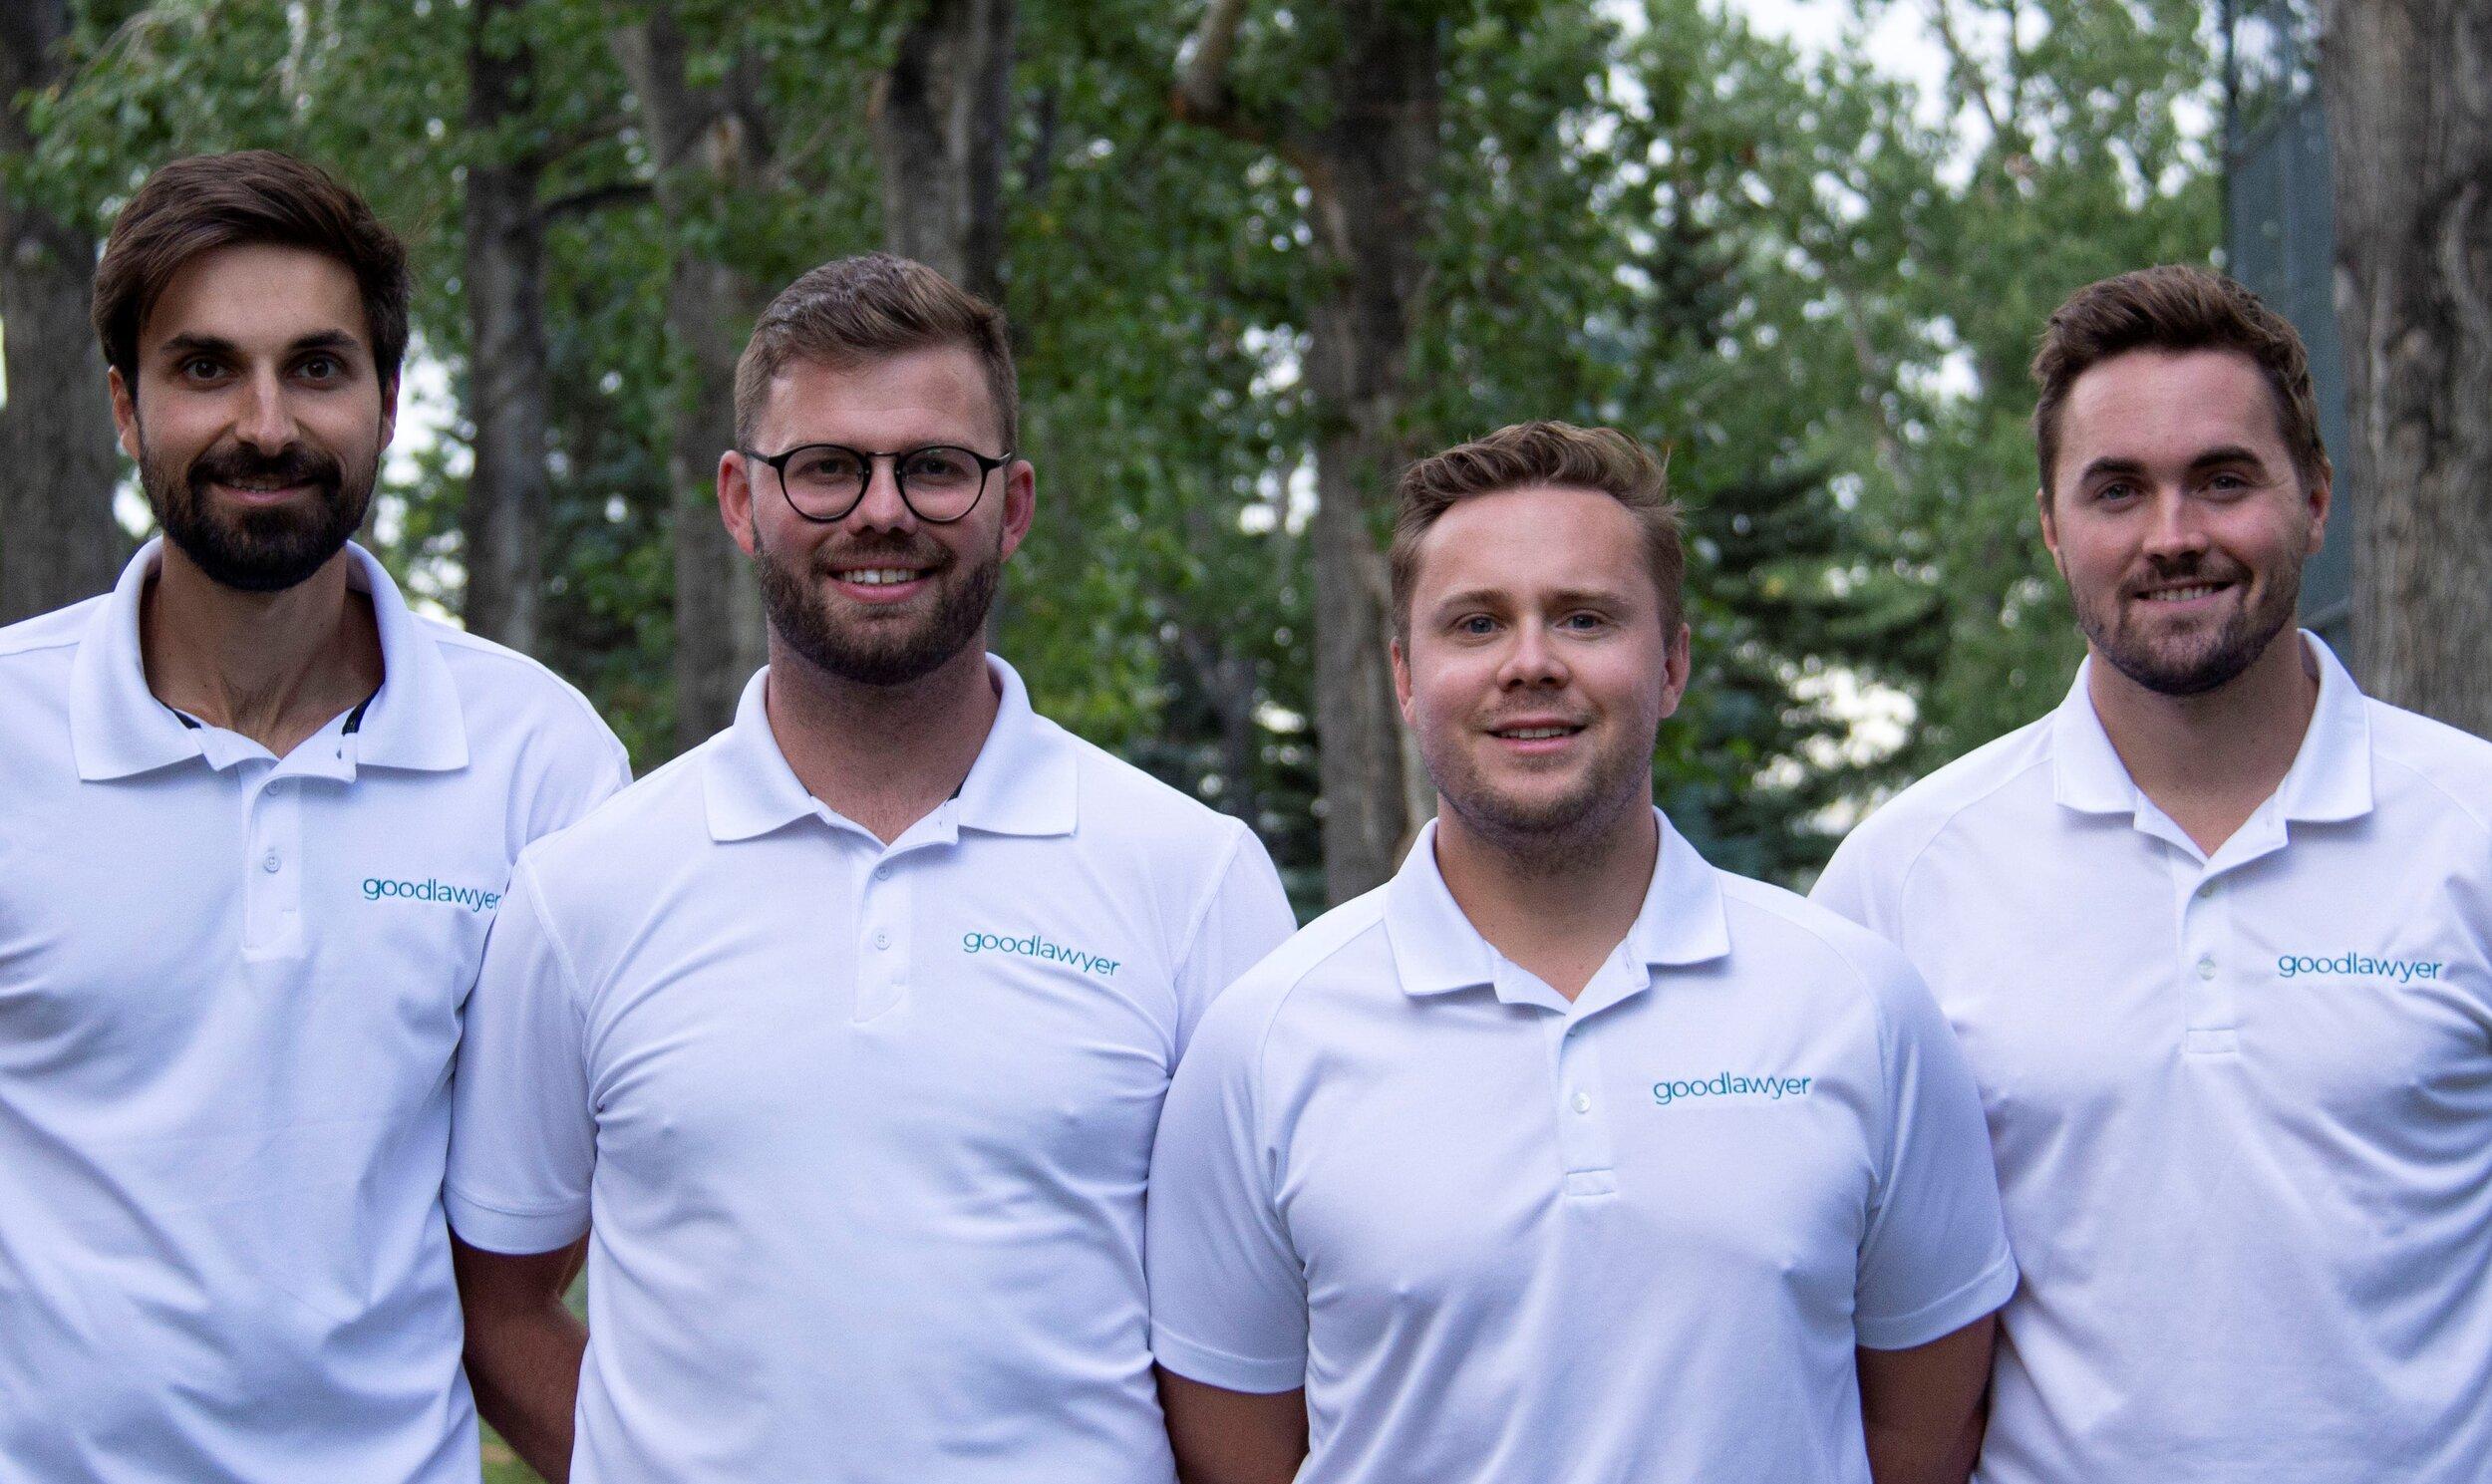 L to R: Tom Alvarez, Co-founder & Lead Product Designer; Brett Colvin, Co-founder & CEO; Steven Bodi, Co-founder, President & COO; Parker Smith, Co-founder & Lead Software Developer